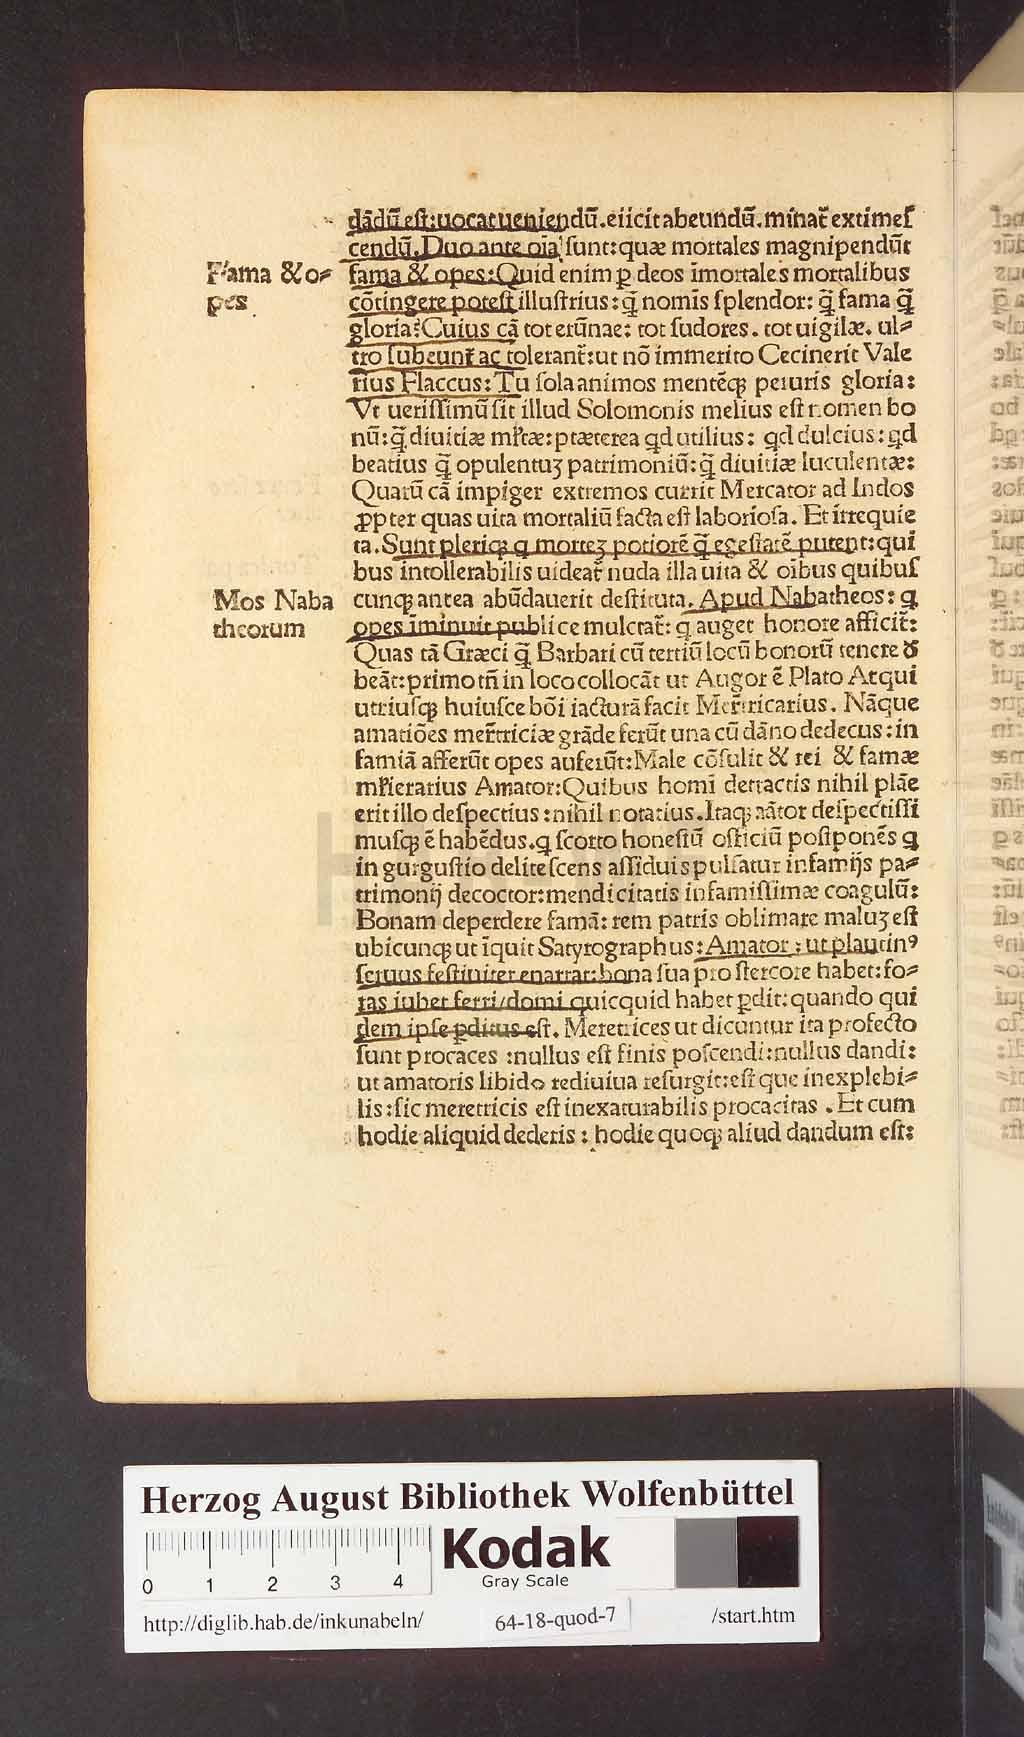 http://diglib.hab.de/drucke/64-18-quod-7/00008.jpg